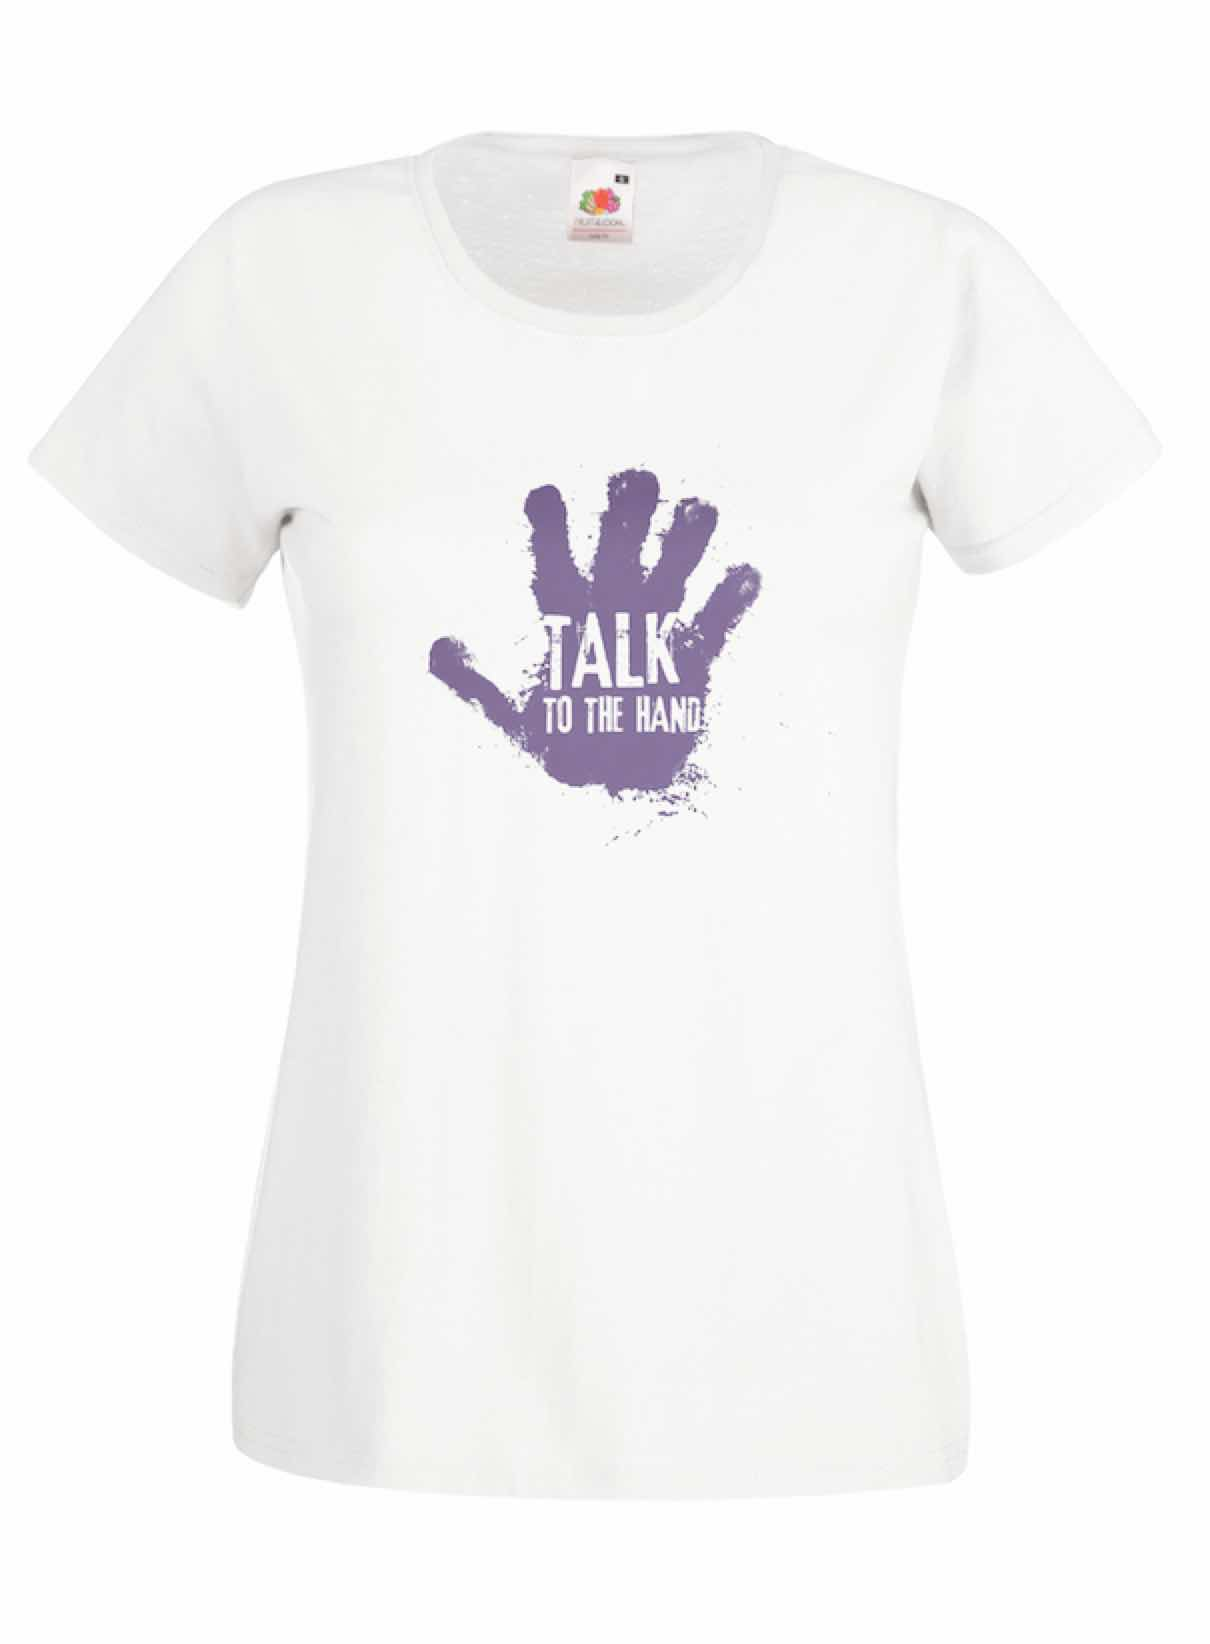 Talk To The Hand design for t-shirt, hoodie & sweatshirt